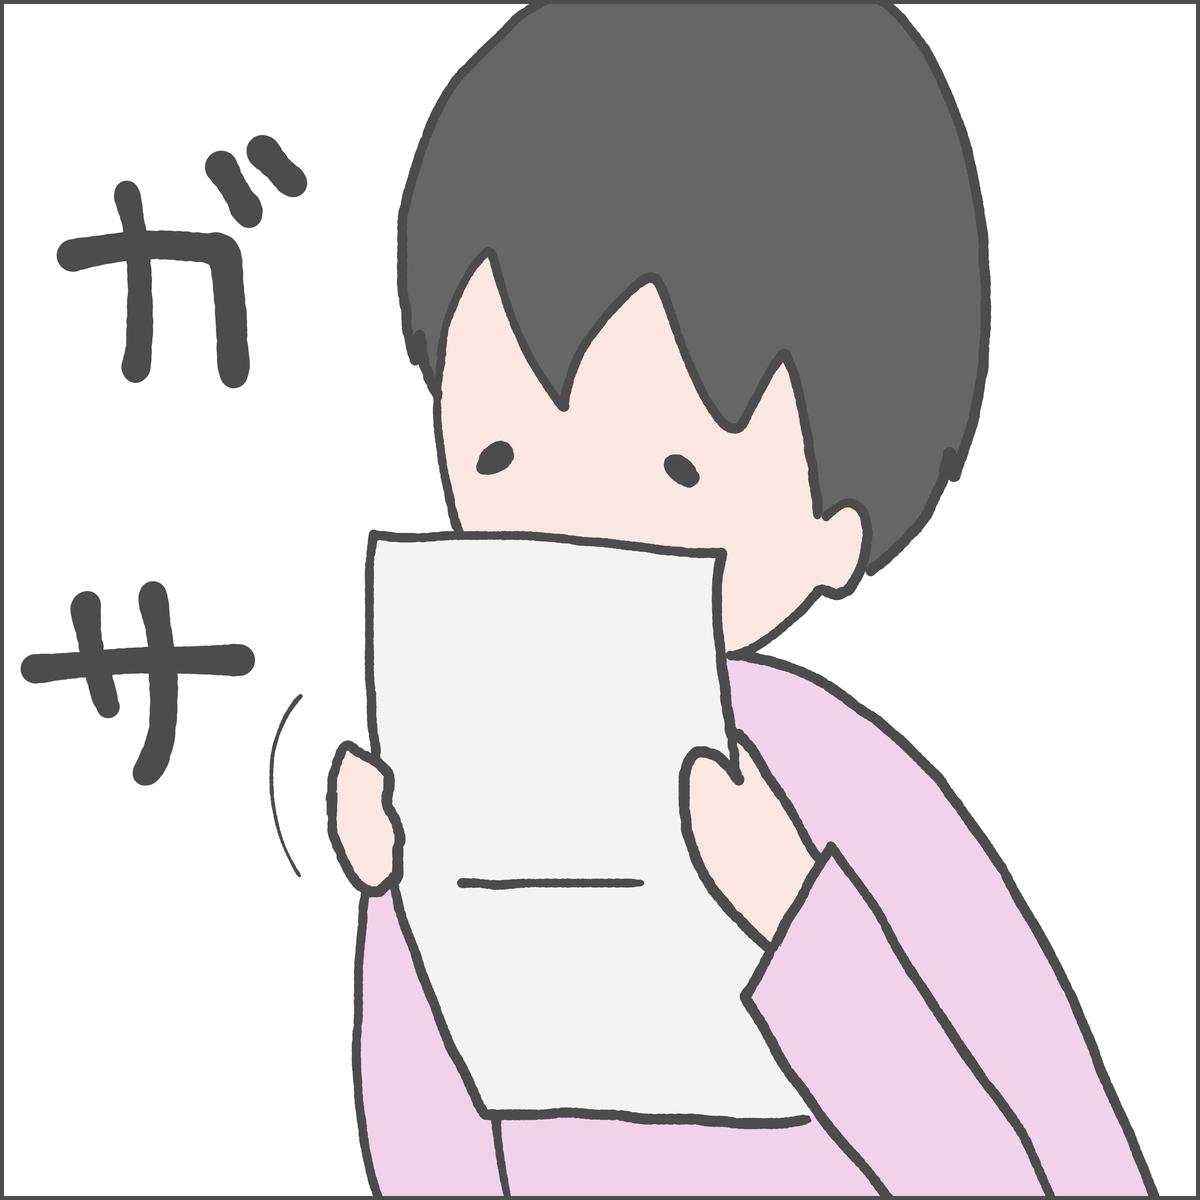 f:id:ika_yoshi:20210320230021j:plain